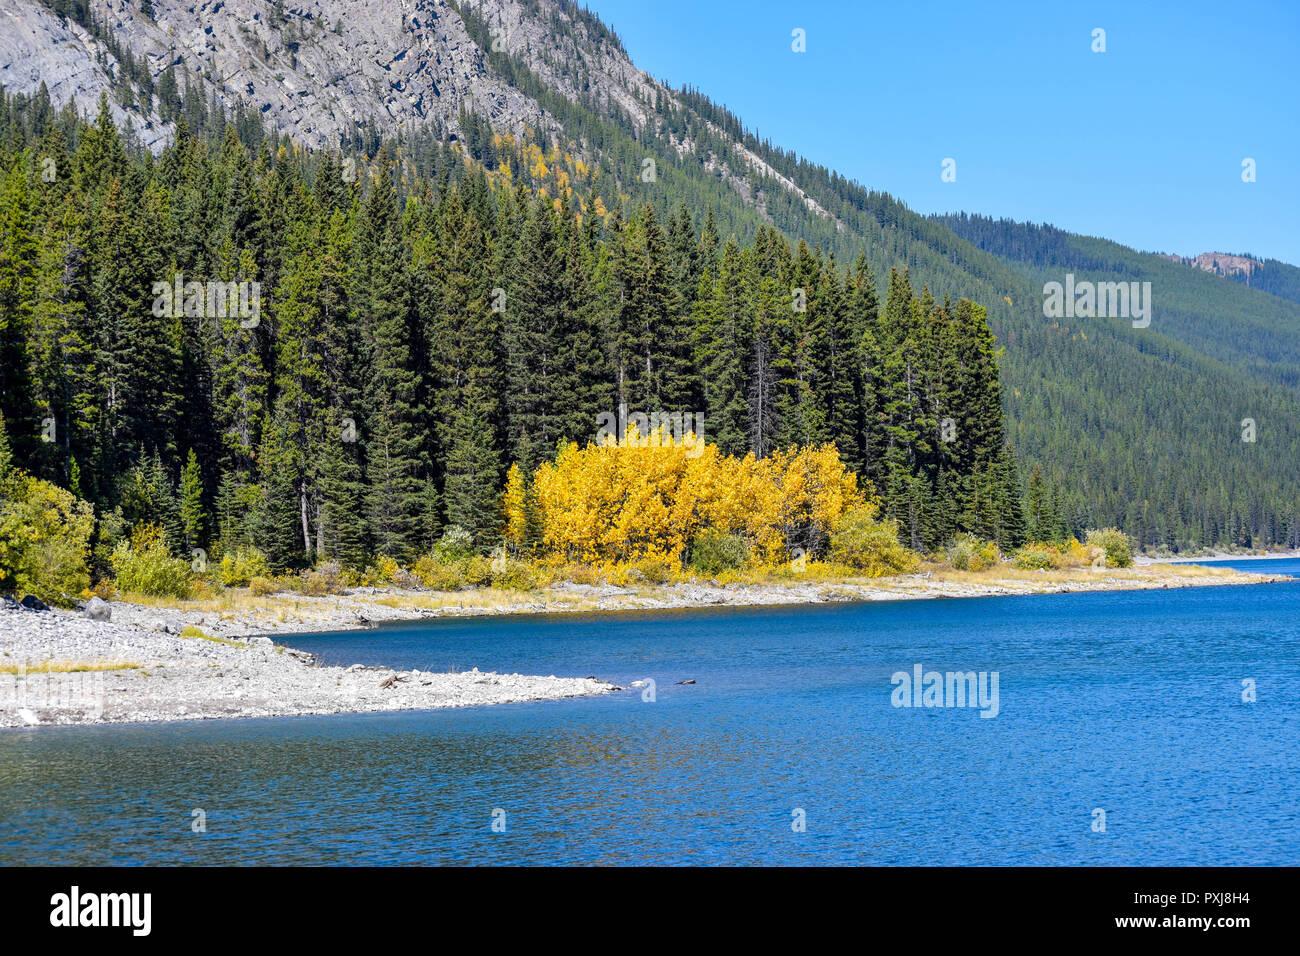 amazing scenery in the Rockies Stock Photo